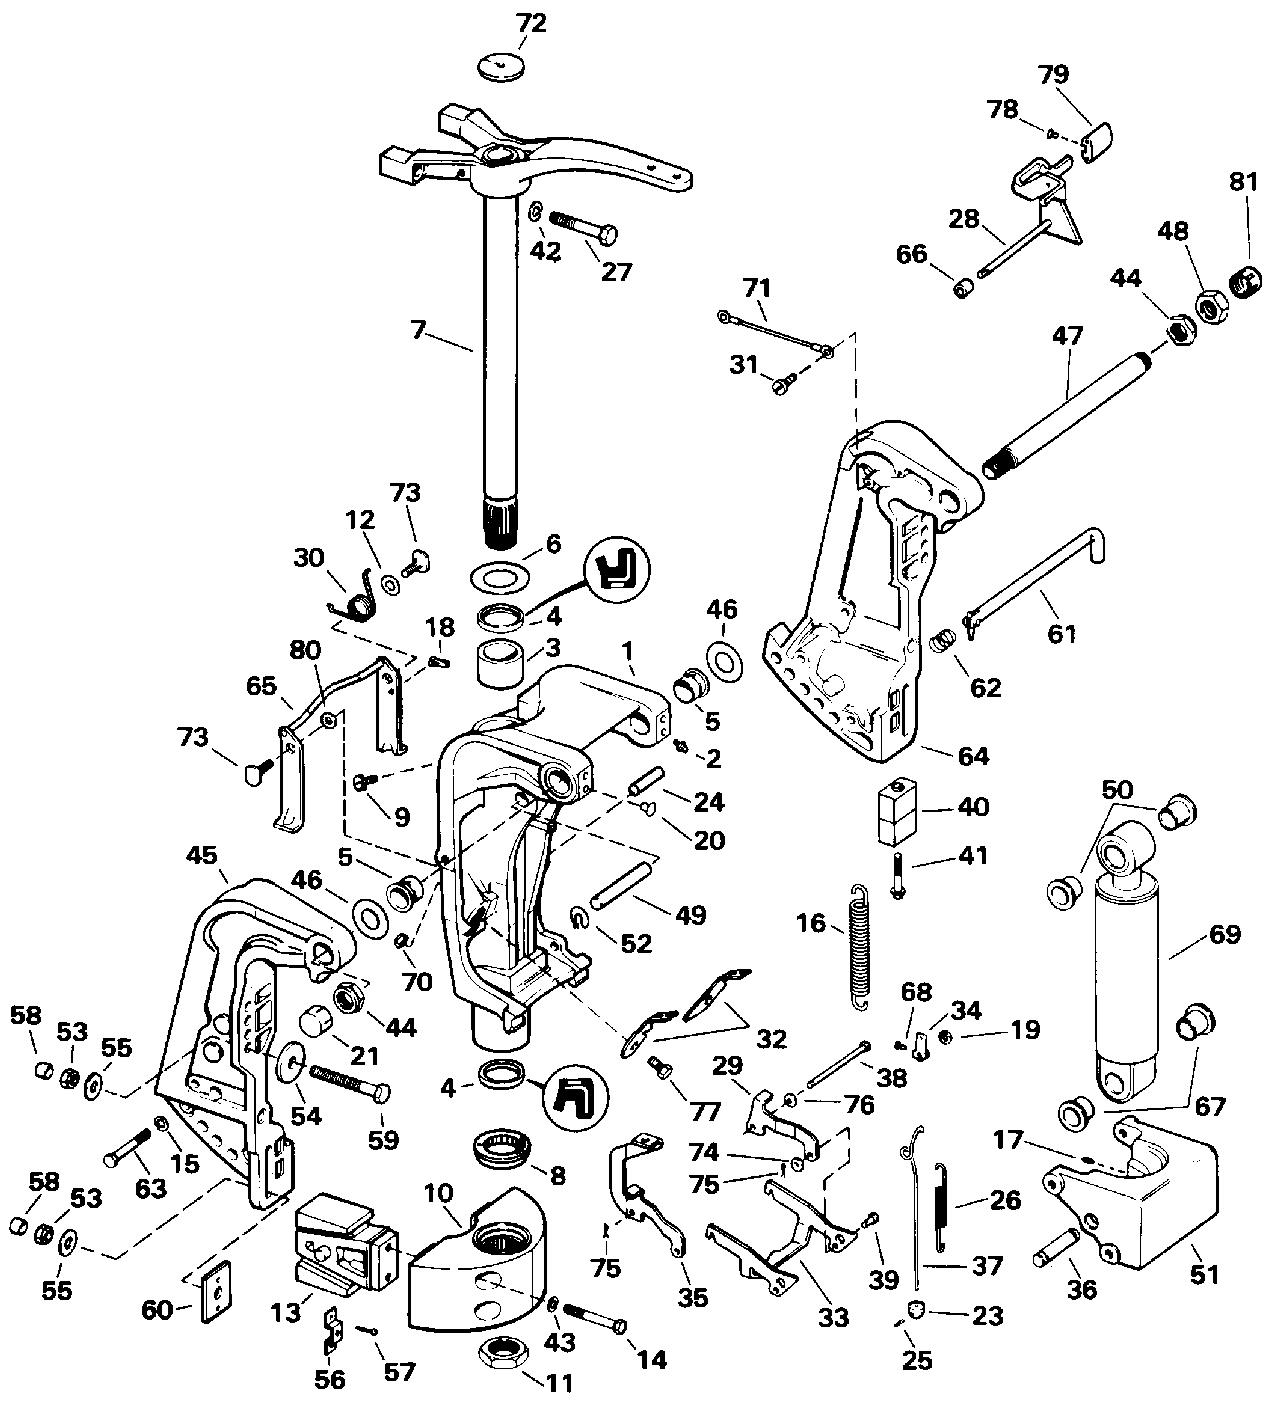 brp johnson en 1993 115 j115tlets 1993 stern bracket rh vansoutboardparts com johnson manual tilt assist cable johnson manual tilt lock